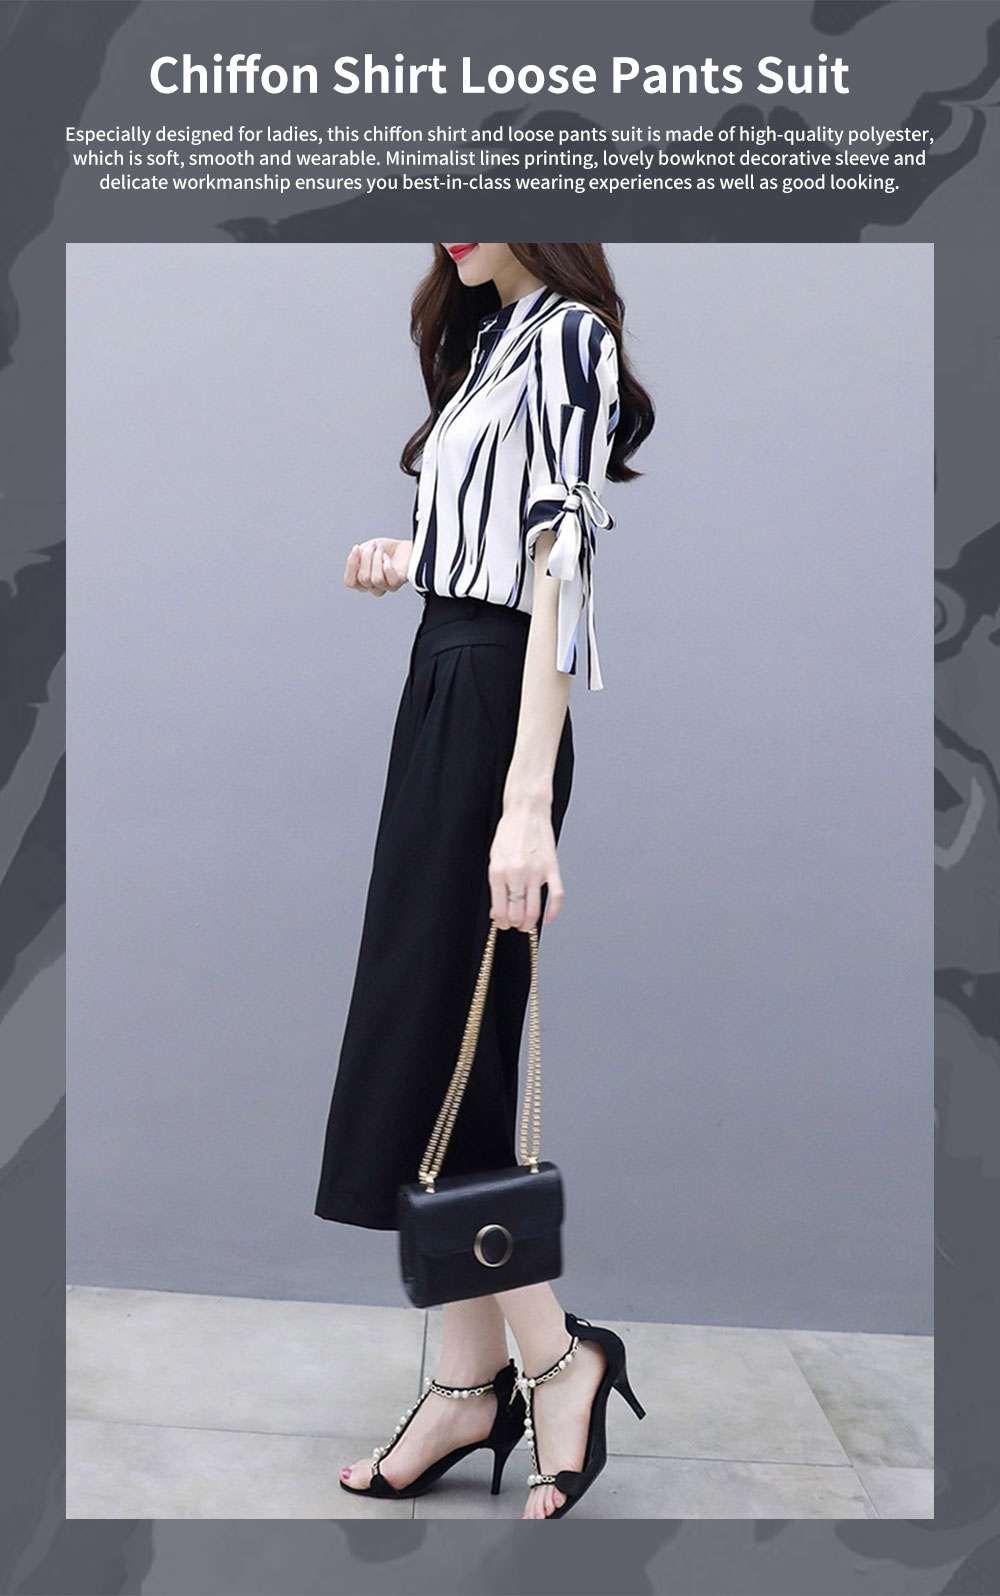 2PCS Minimalist Stylish Lines Printing Ladies Chiffon Shirt Loose Pants Suit Half Sleeve Tops Straight-leg Pants for Women 0